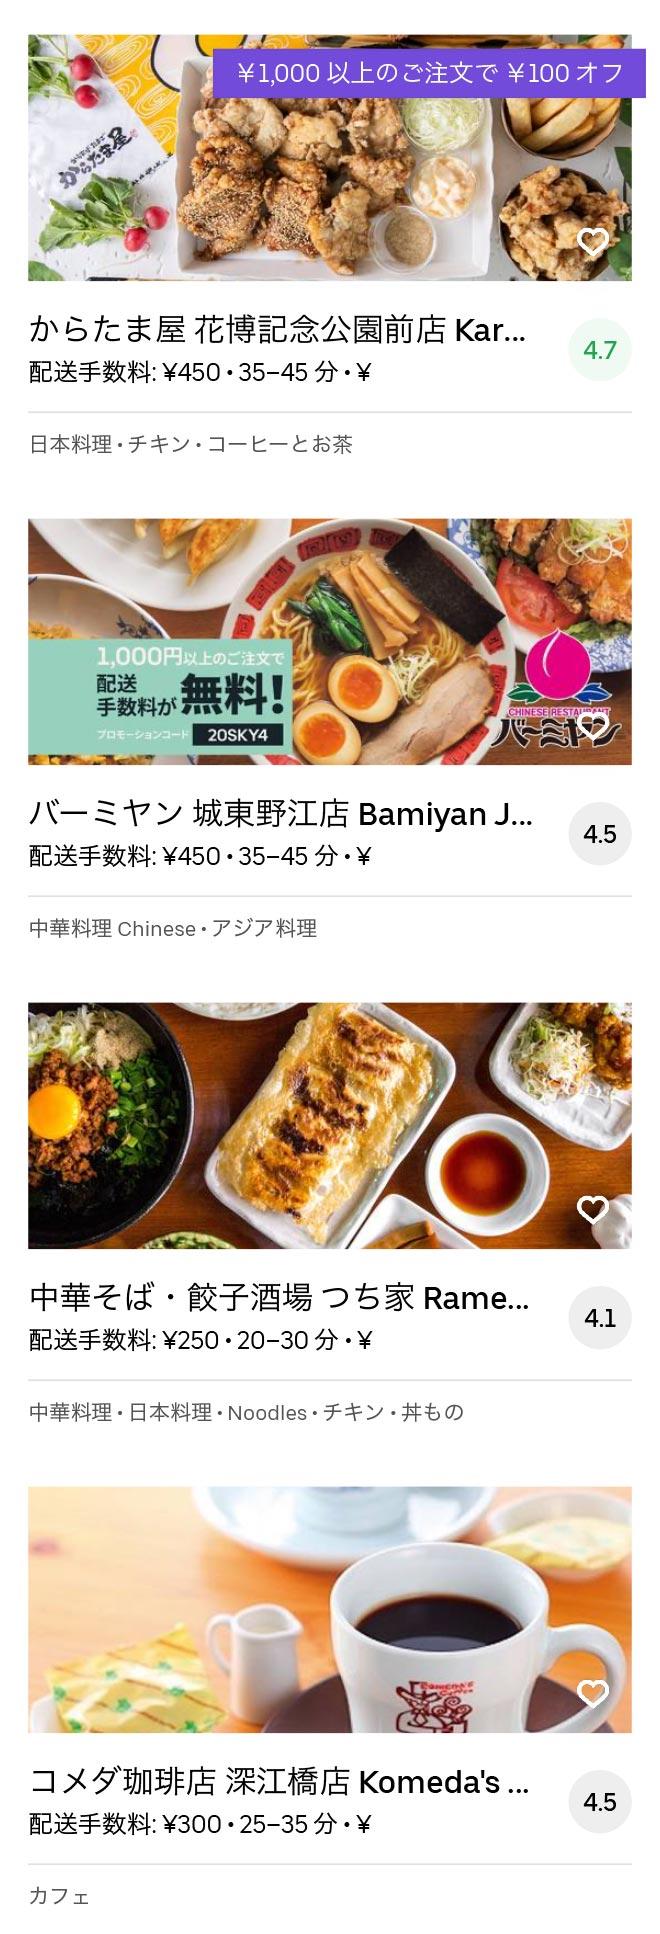 Higashi osaka nagata menu 2005 11